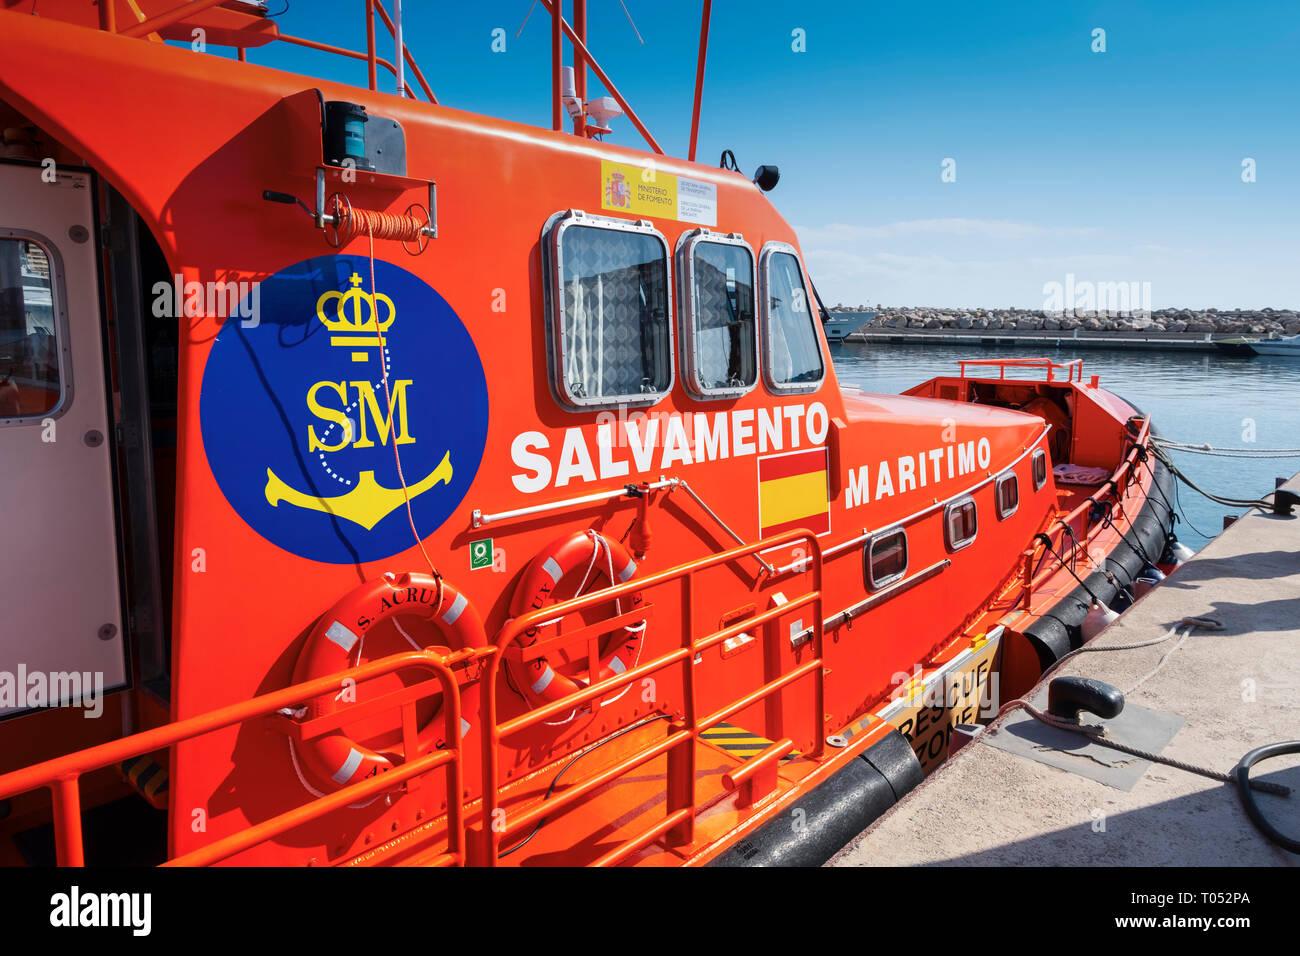 Salvamento Maritimo. Marine rescue boat. Lifeboat moored in the harbor at Marina Puerto Portals, Palma de Mallorca. Majorca, Balearic Islands, Spain E Stock Photo